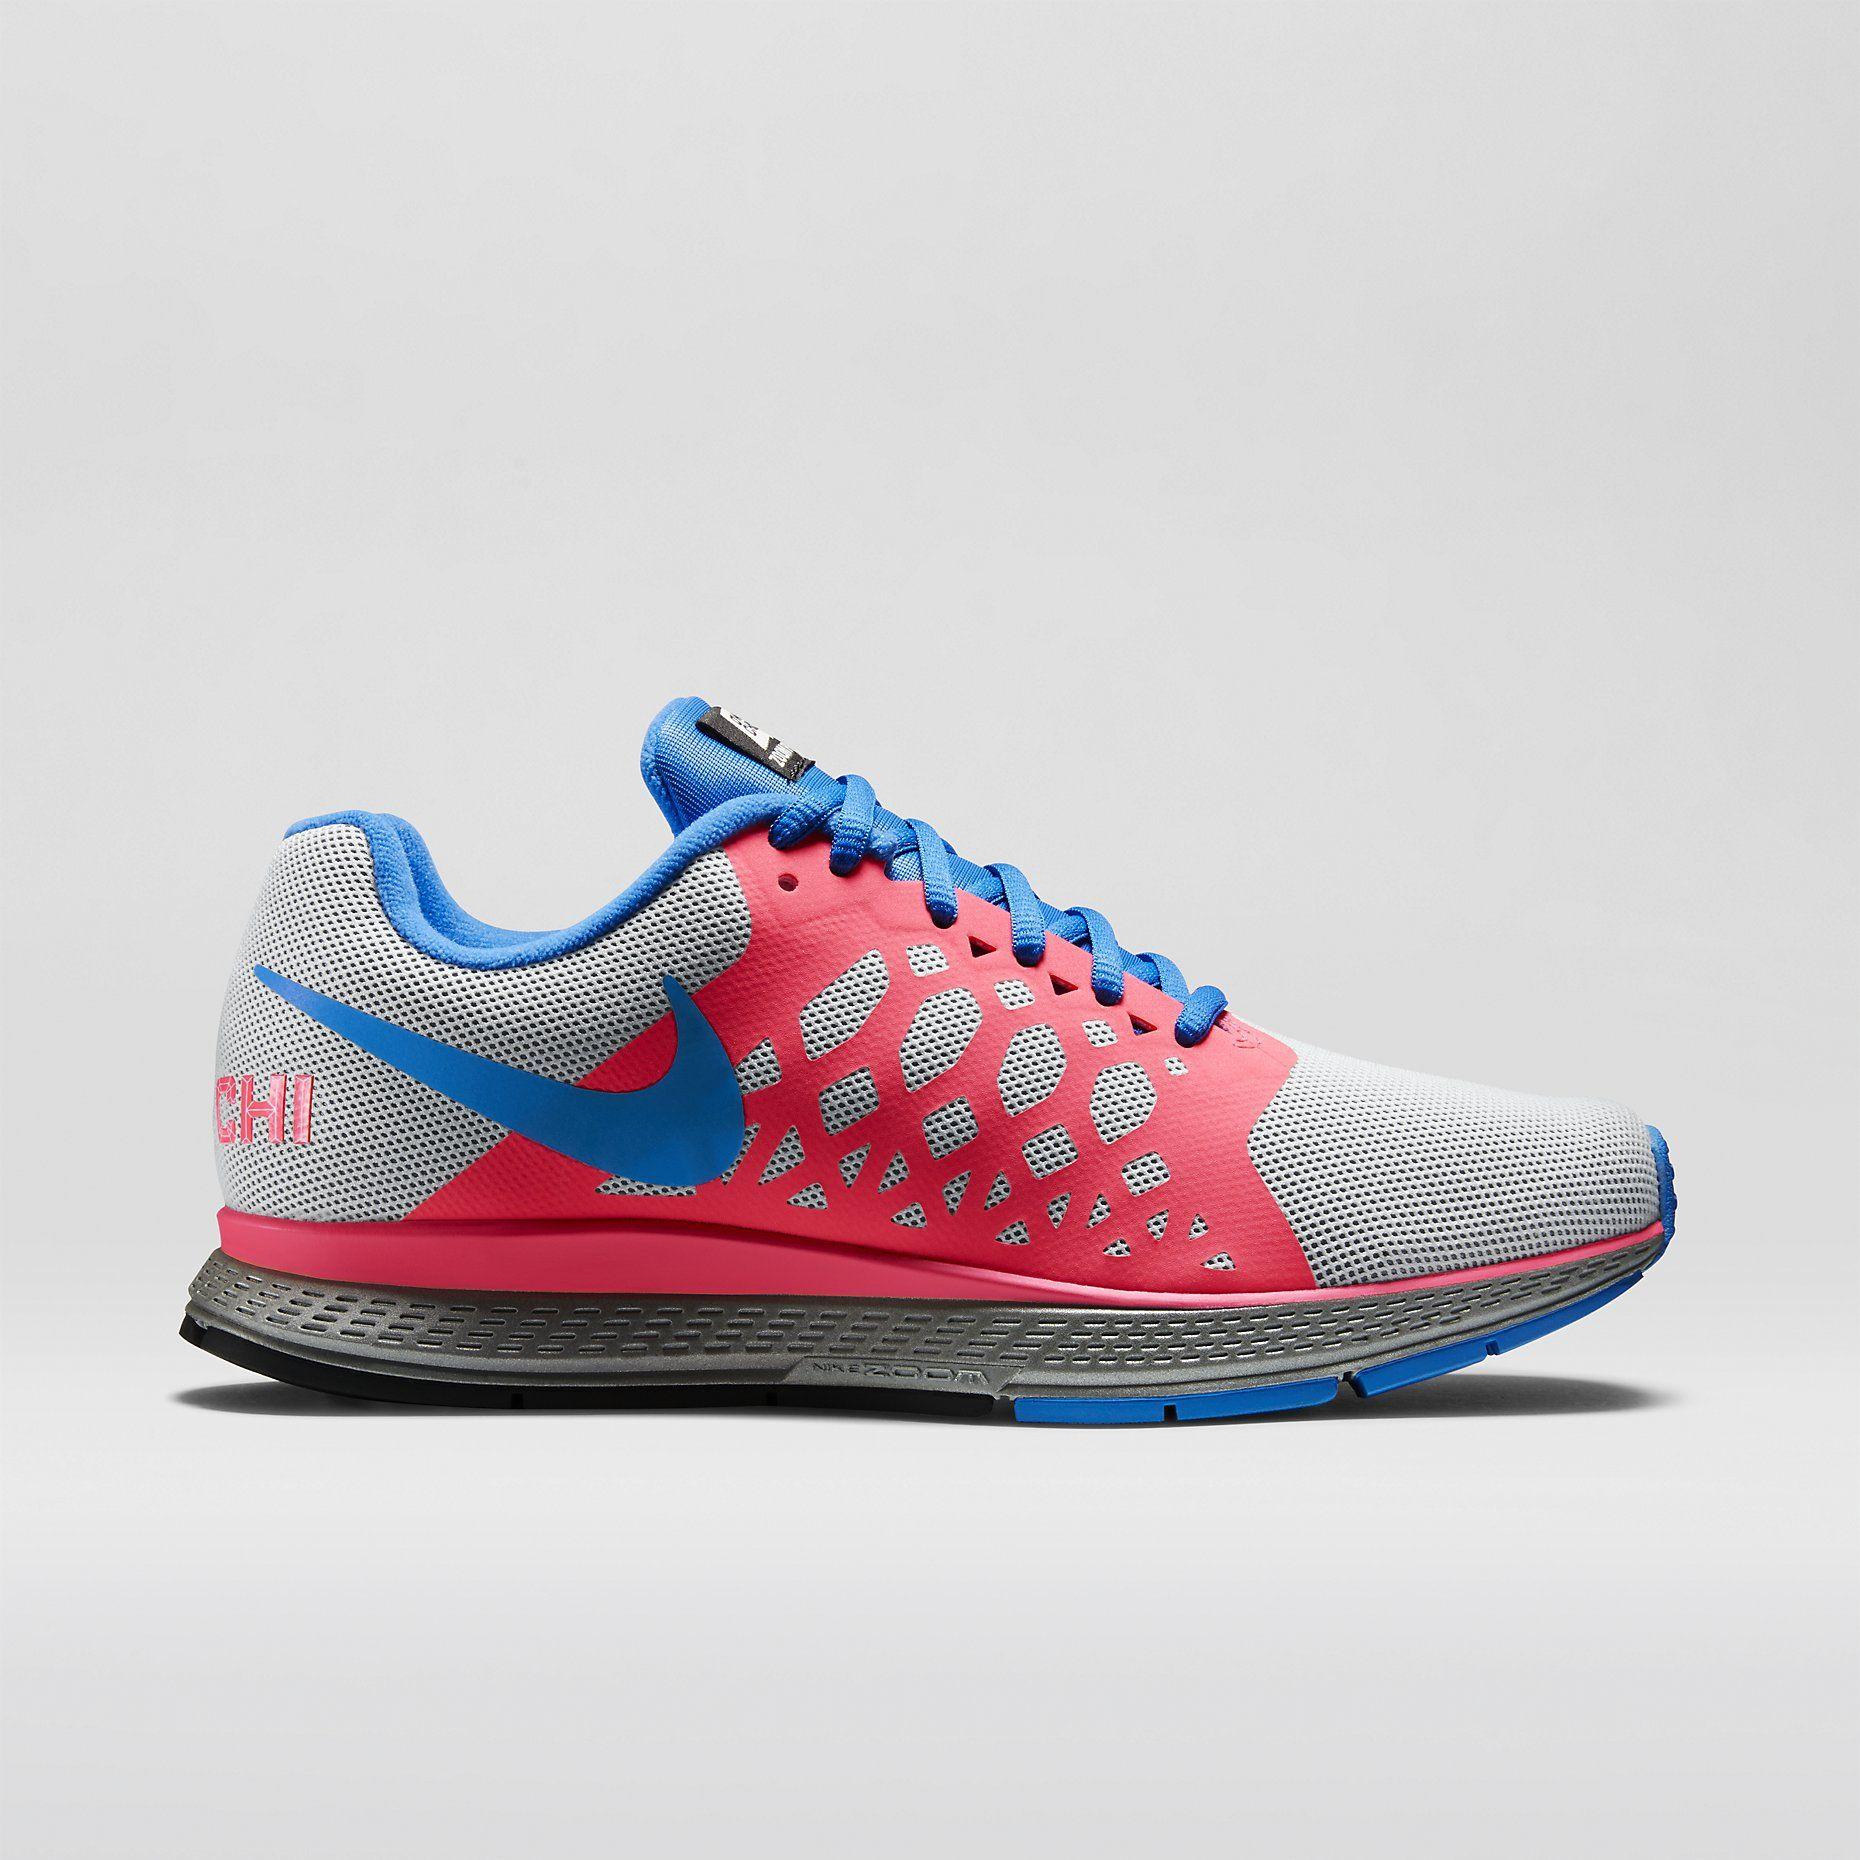 3089dfe09fc Nike Air Zoom Pegasus 31 Flash (2014 Chicago Marathon) Women s Running Shoe.  Nike Store